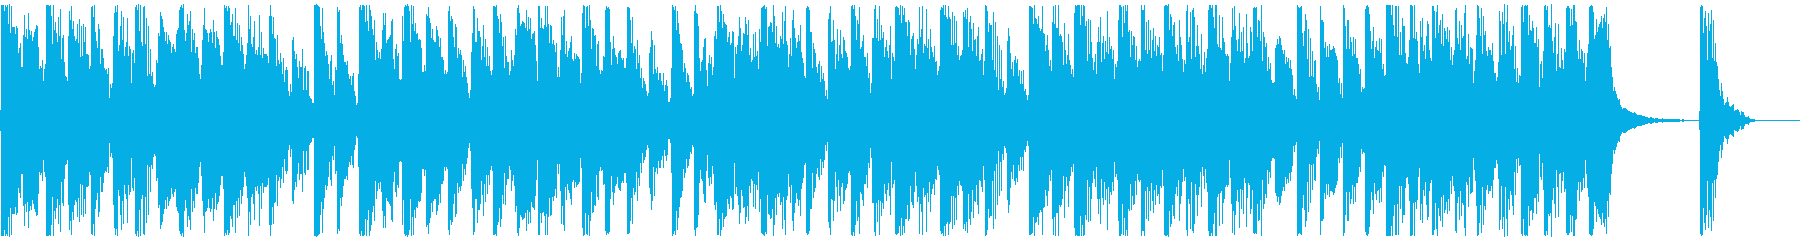 Chorus & Acoustic Band Heartwarming Jingle's reproduced waveform